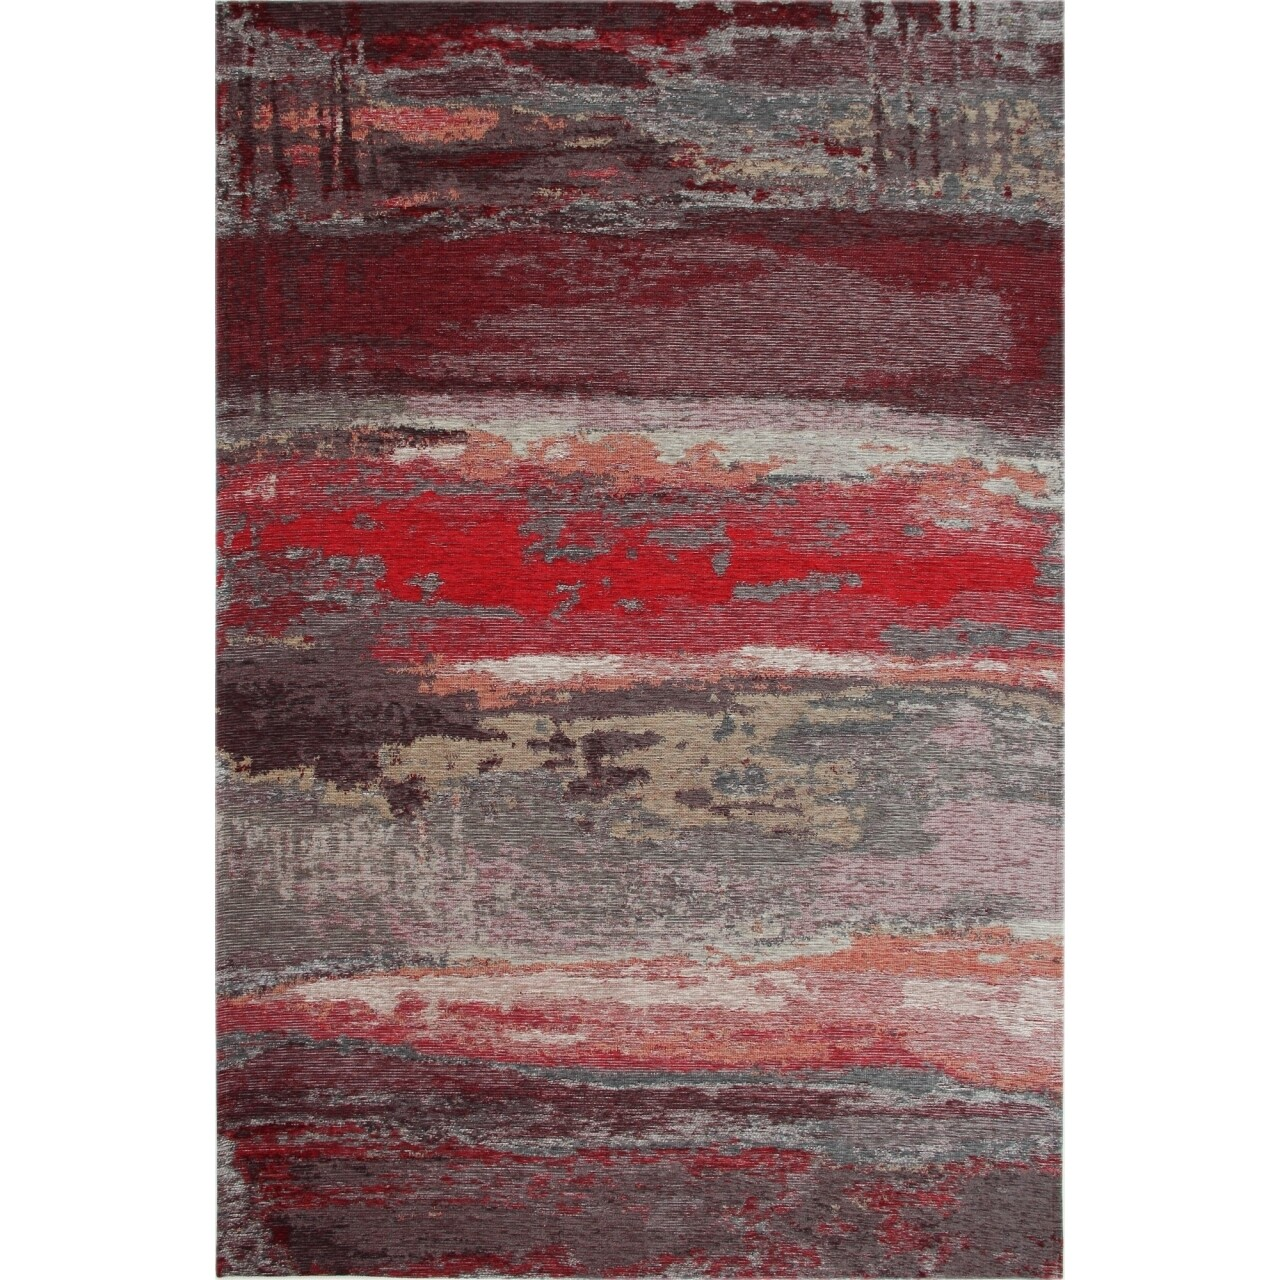 Covor rezistent Eko, SM 12 - Grey, Red XW, 100% acril,  200 x 290 cm